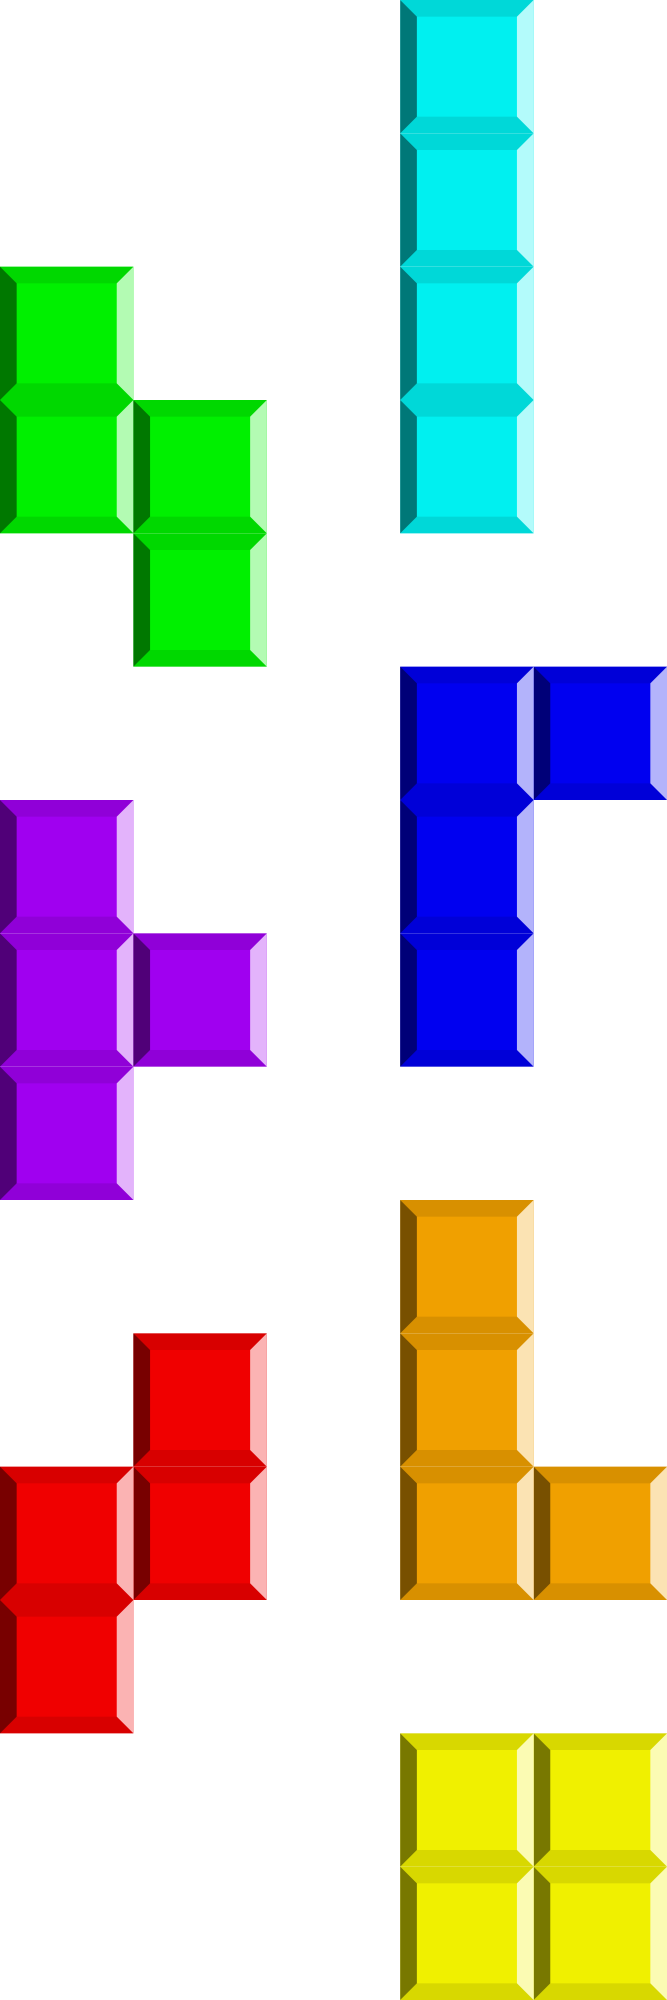 tetris-geburtstag